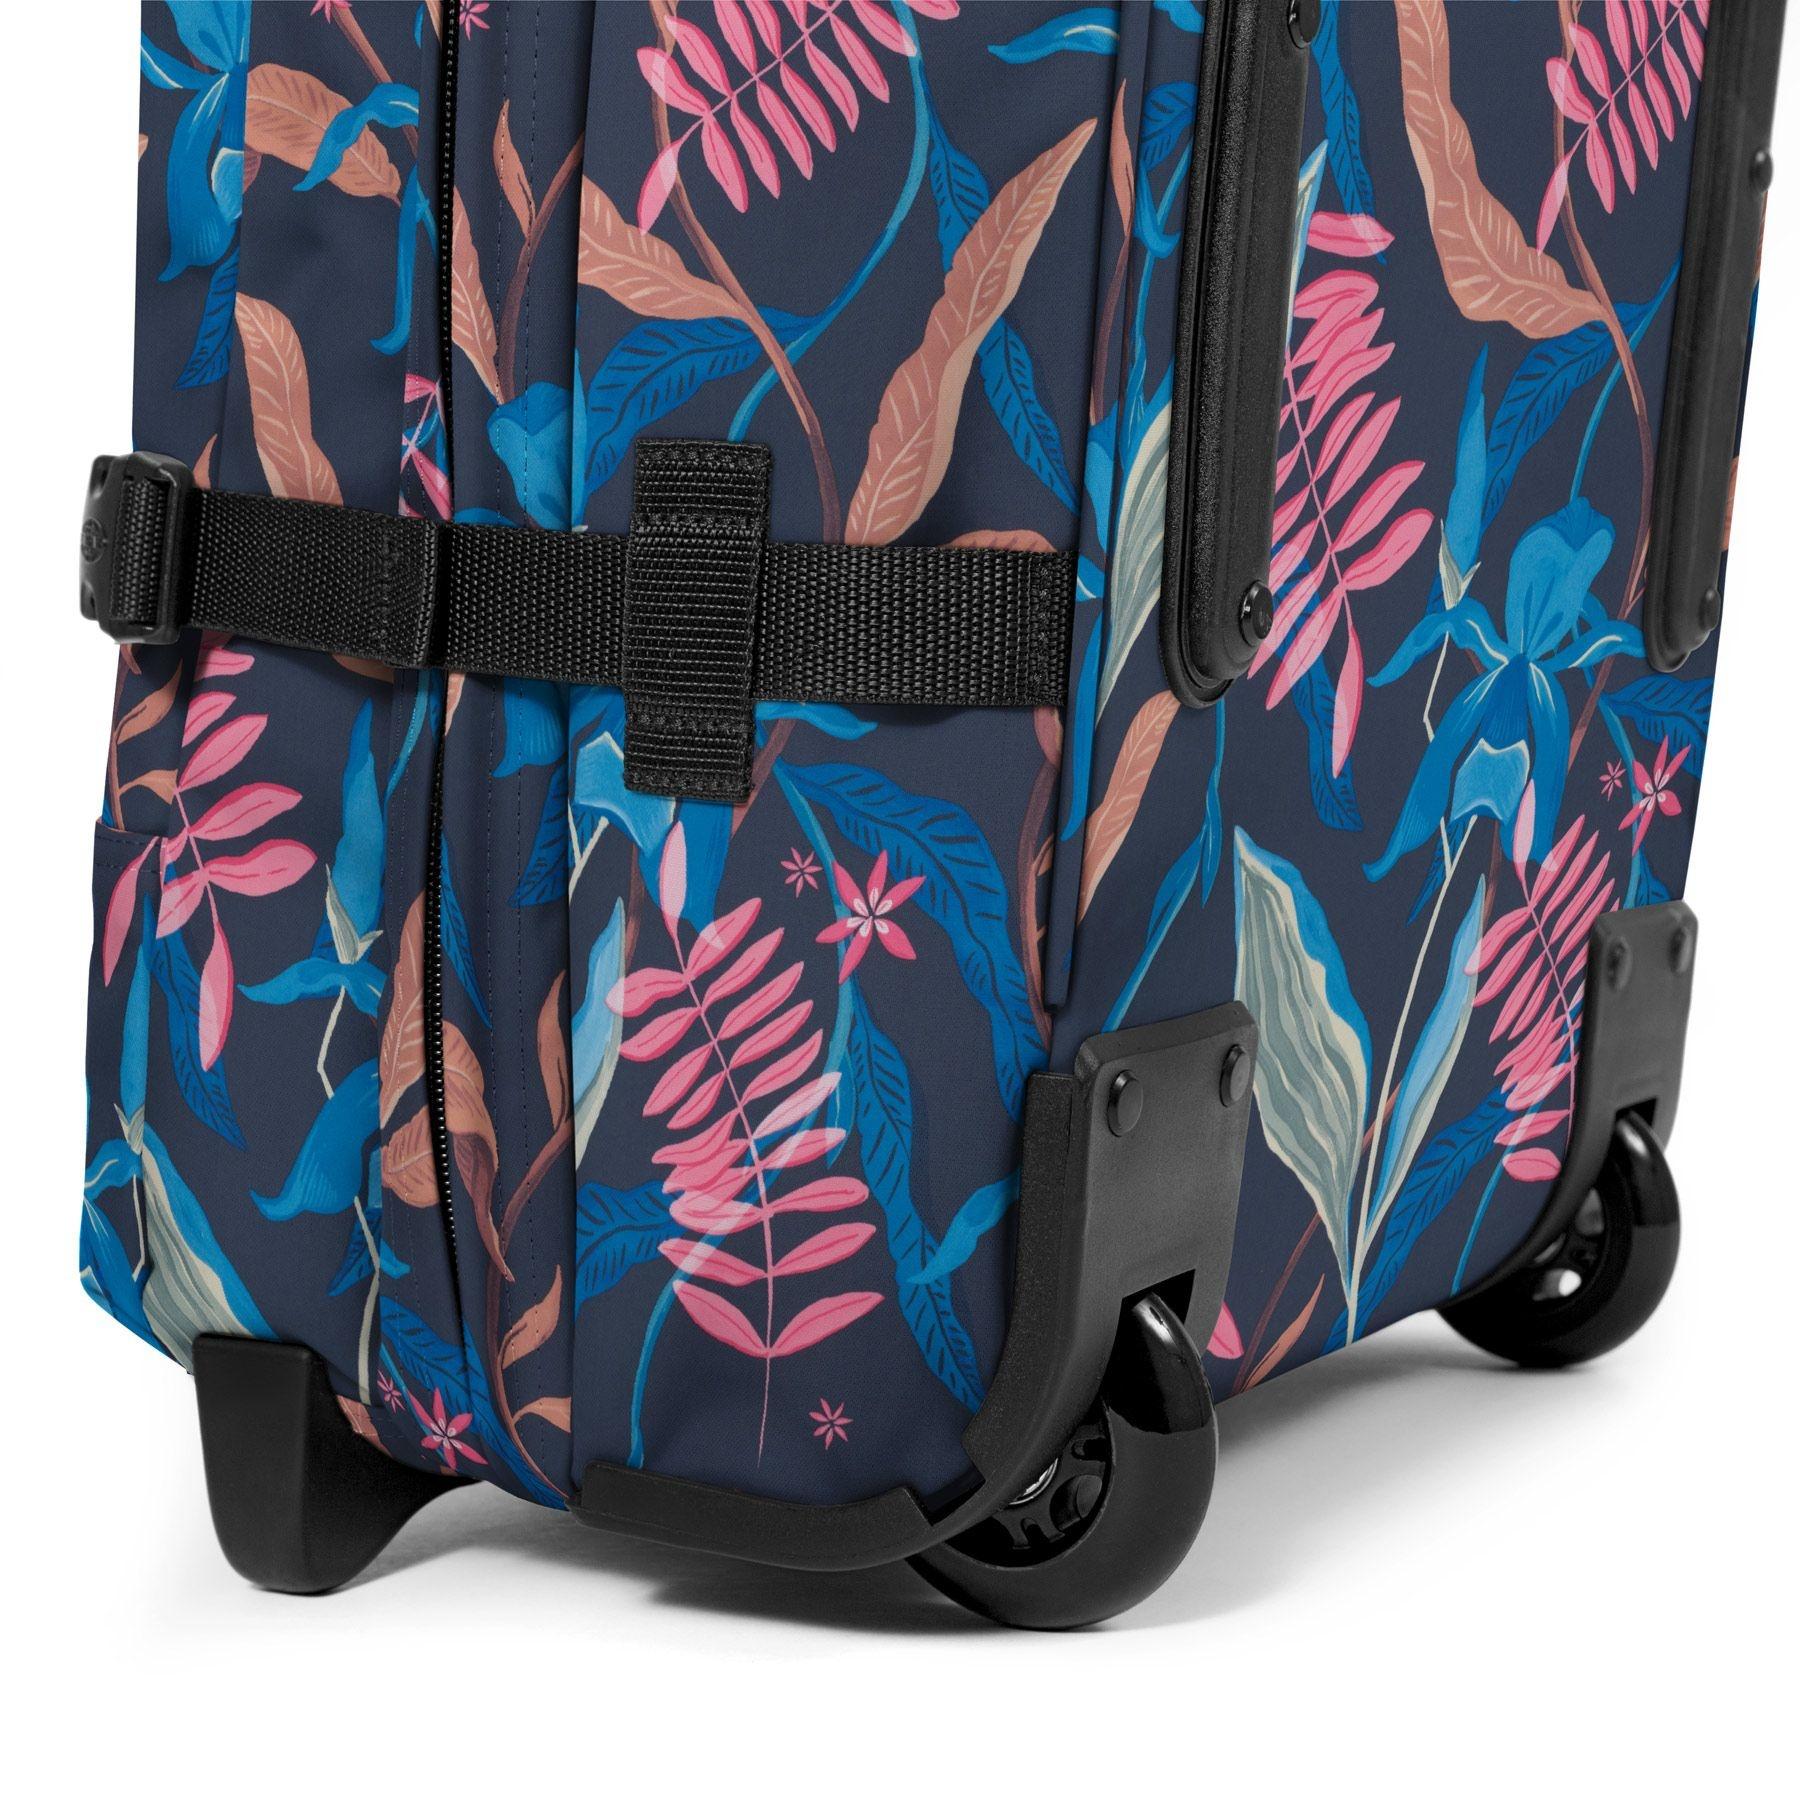 Eastpak Eastpak Tranverz S Whimsy Navy Handbagage reistas met trolley en wieltjes